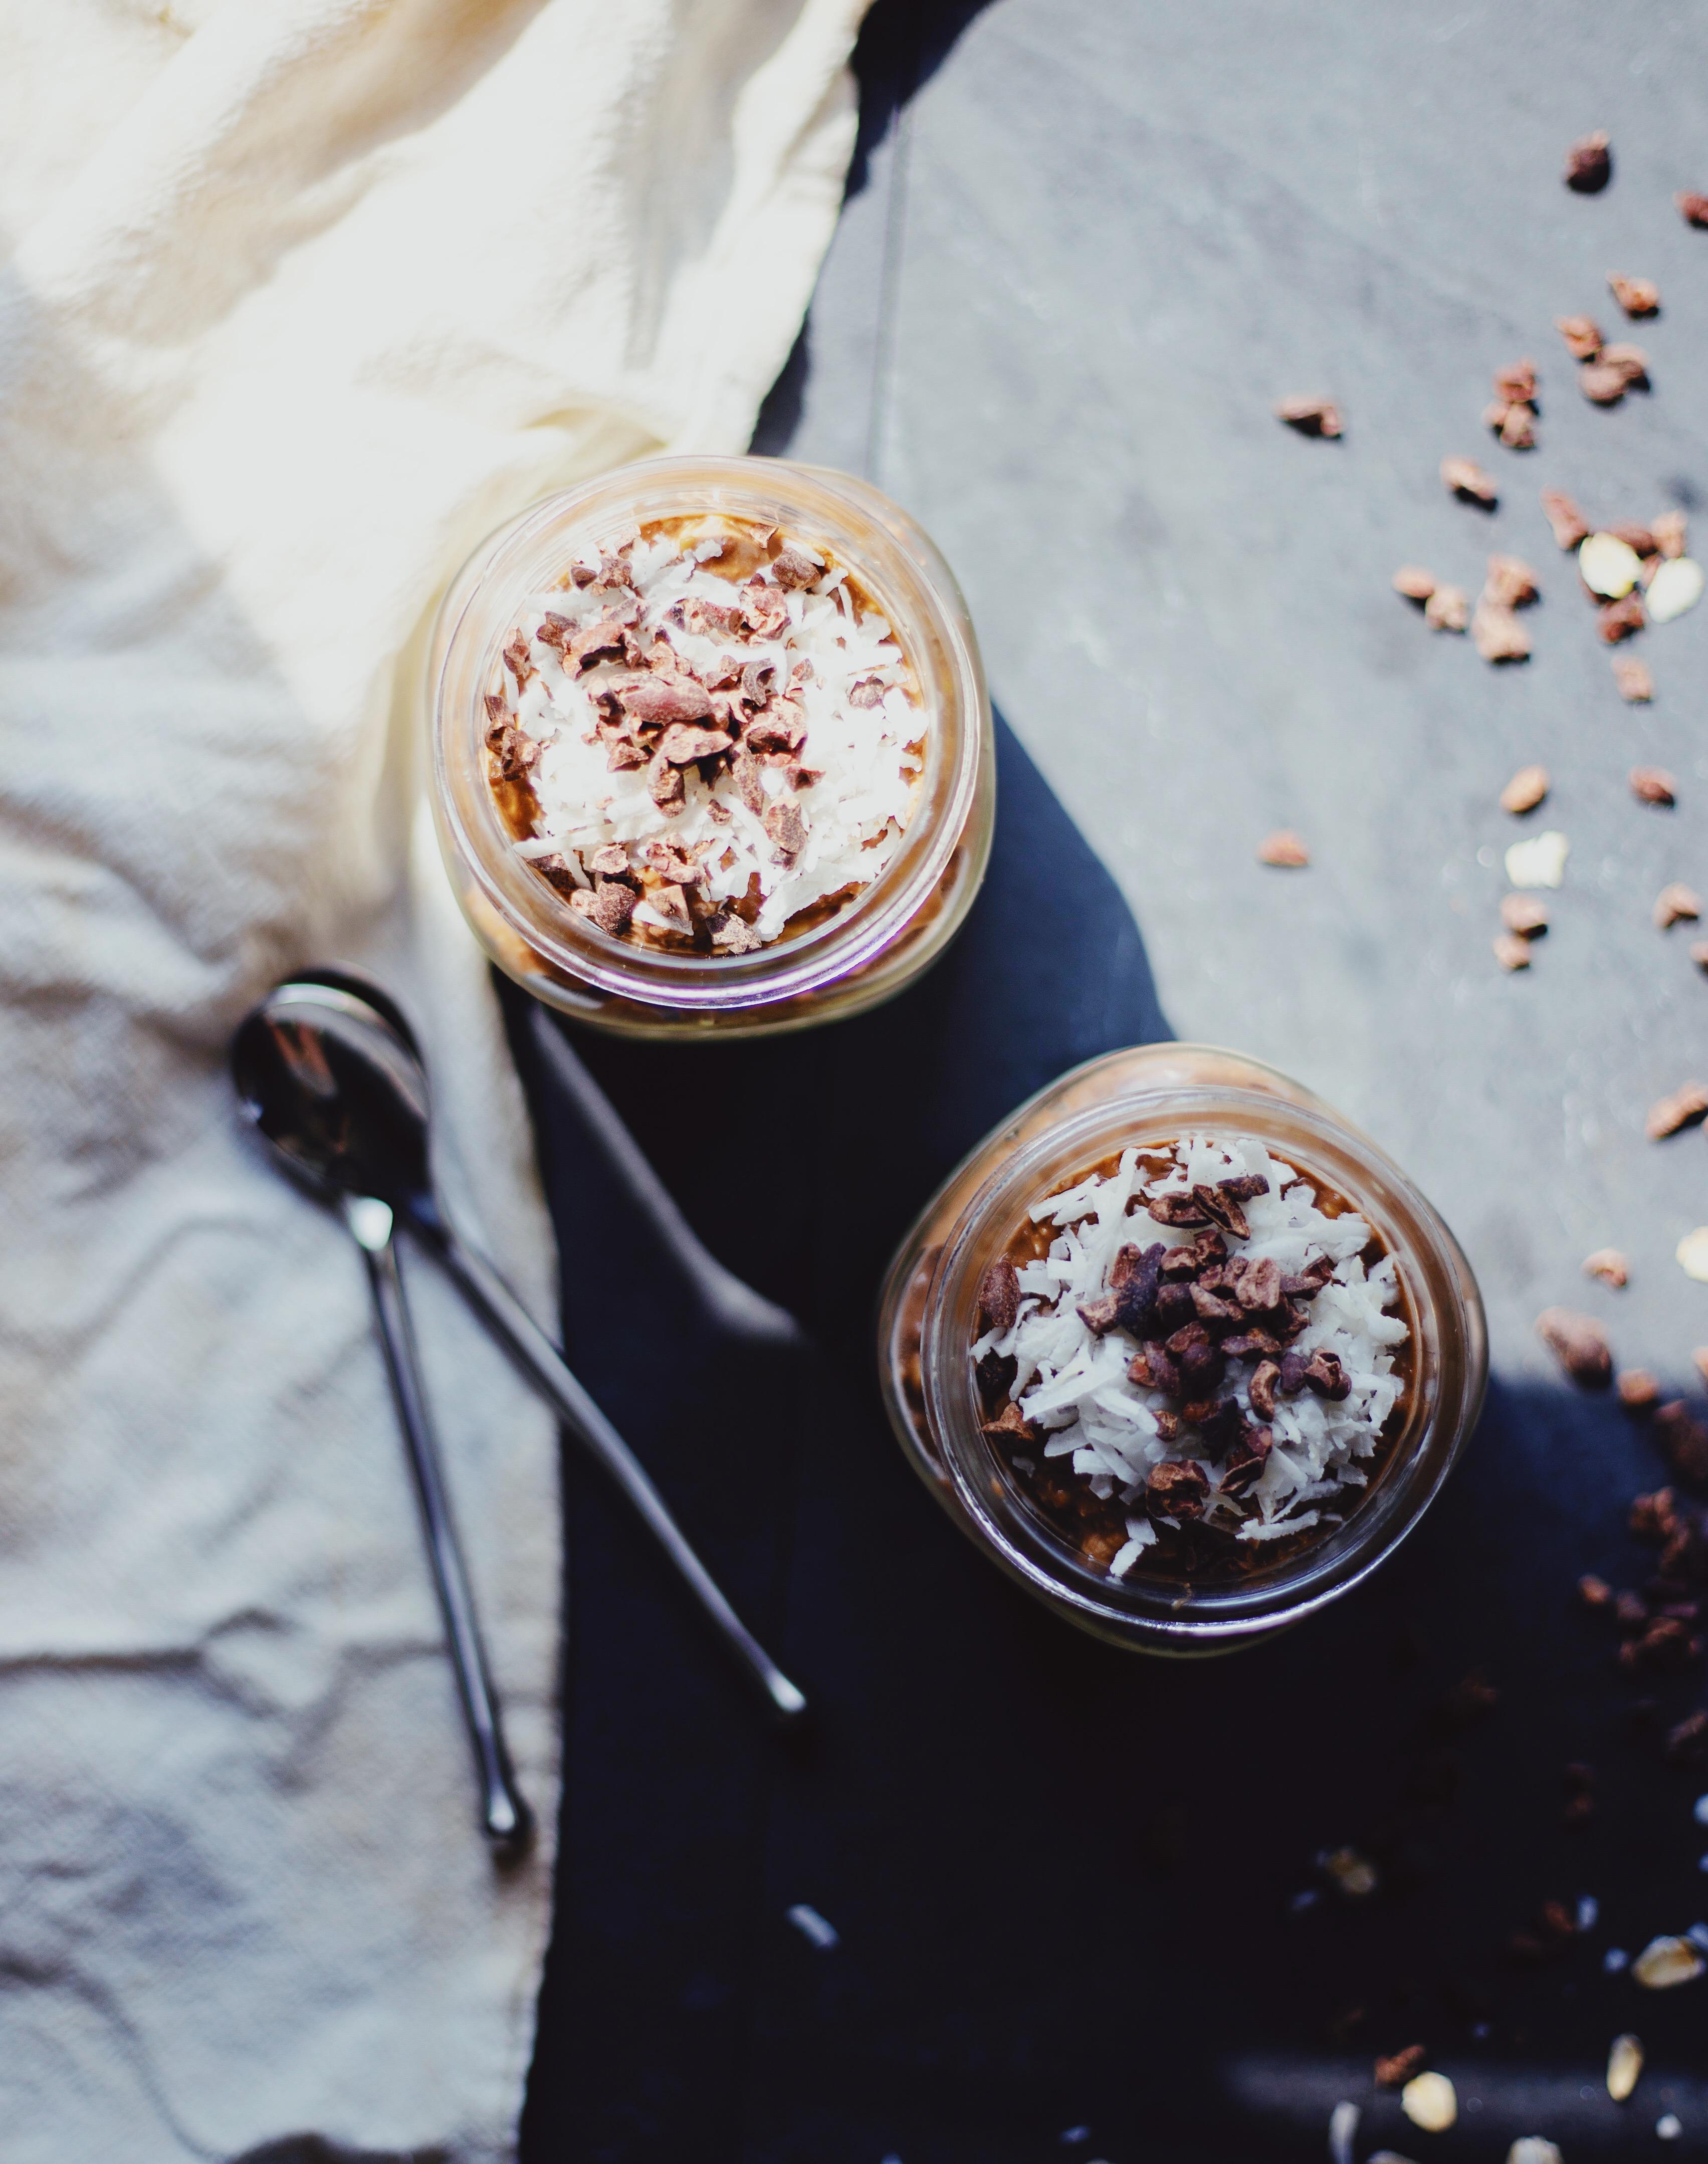 Healthy gluten free and vegan chocolate breakfast recipe